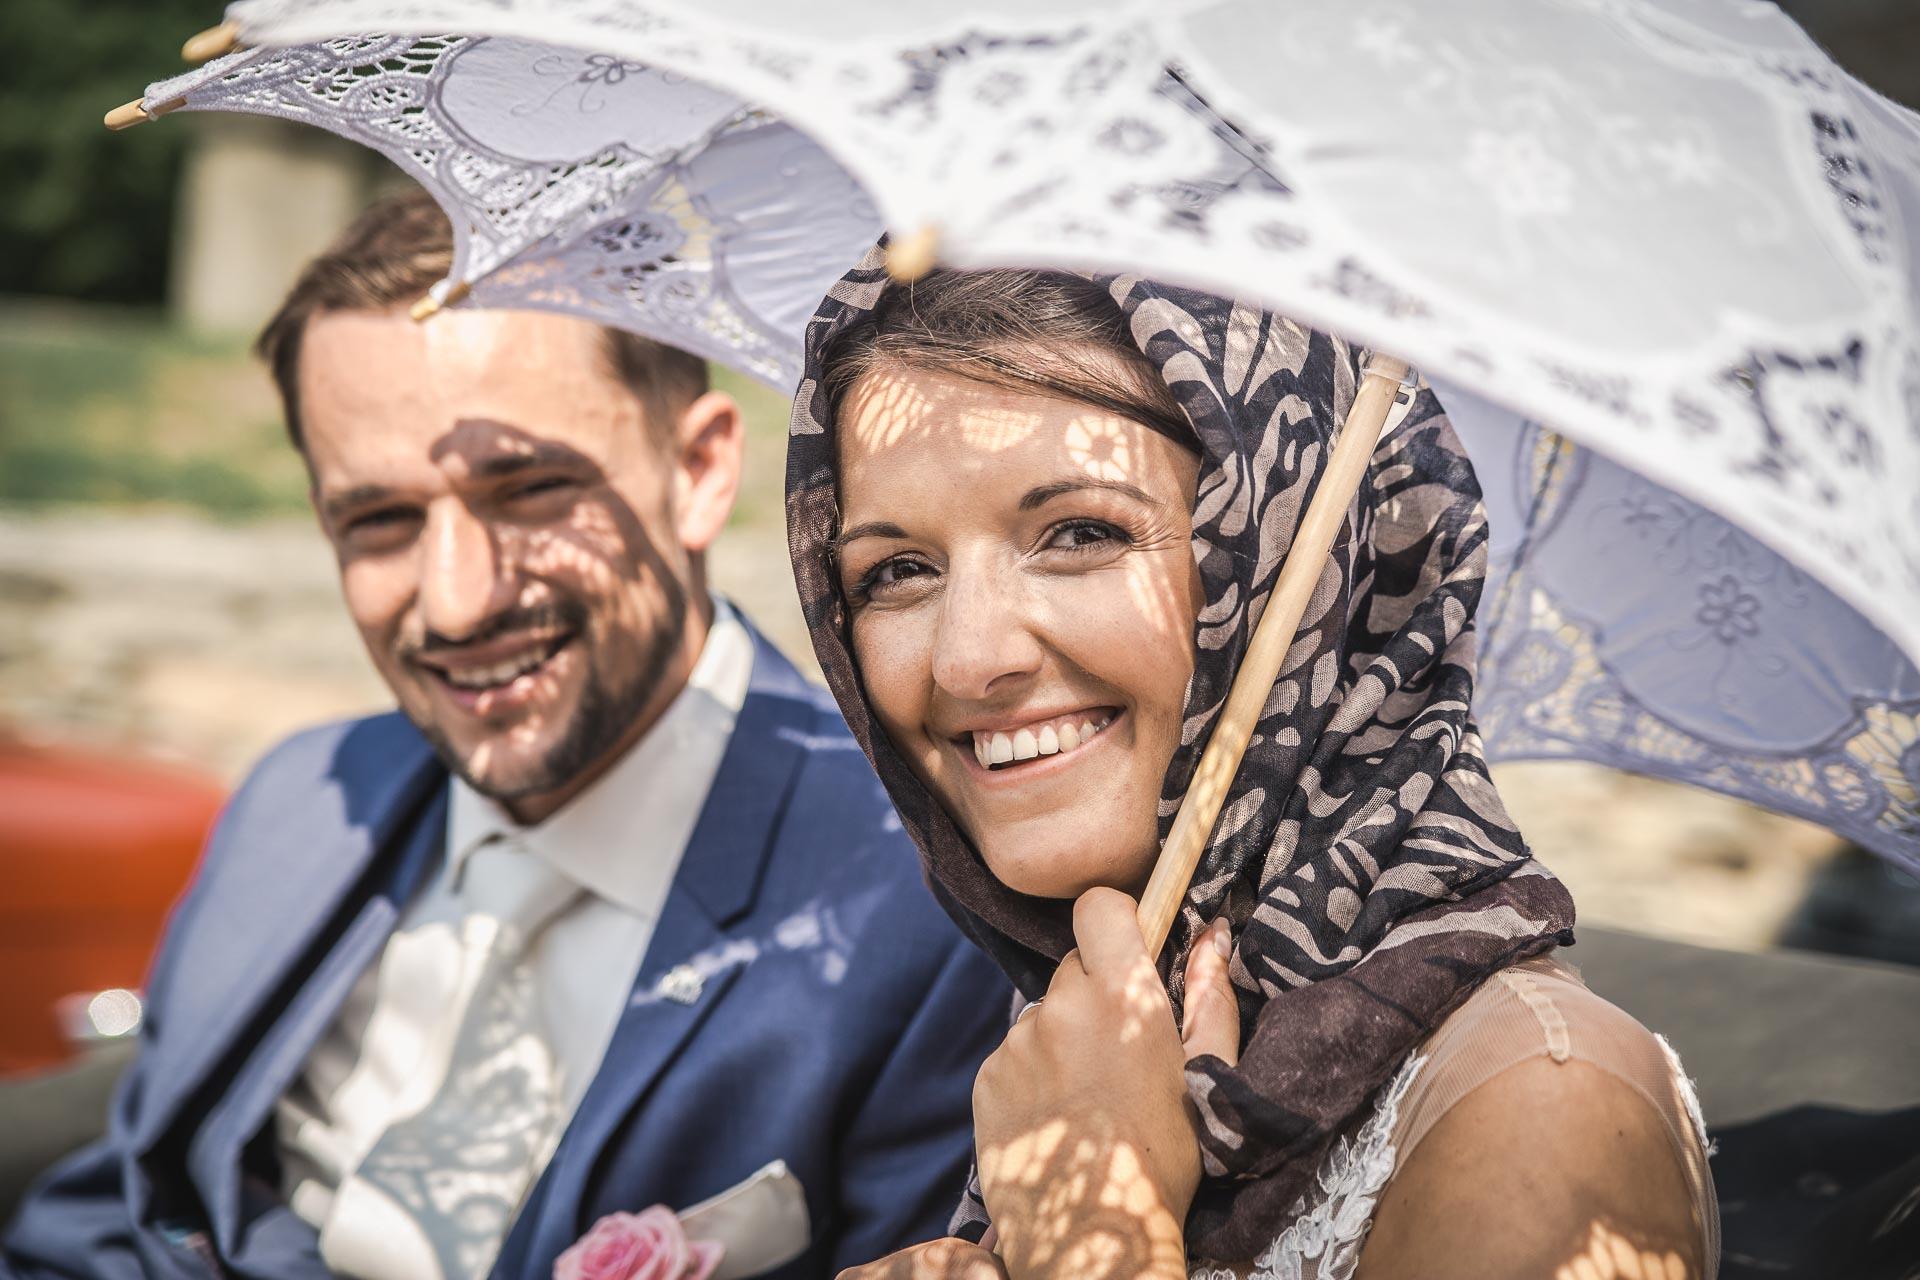 svatební-fotograf-wedding-svatebni-video-orlík-vltava-kostel-statek-stodola-boho-svatba-Beautyfoto-343